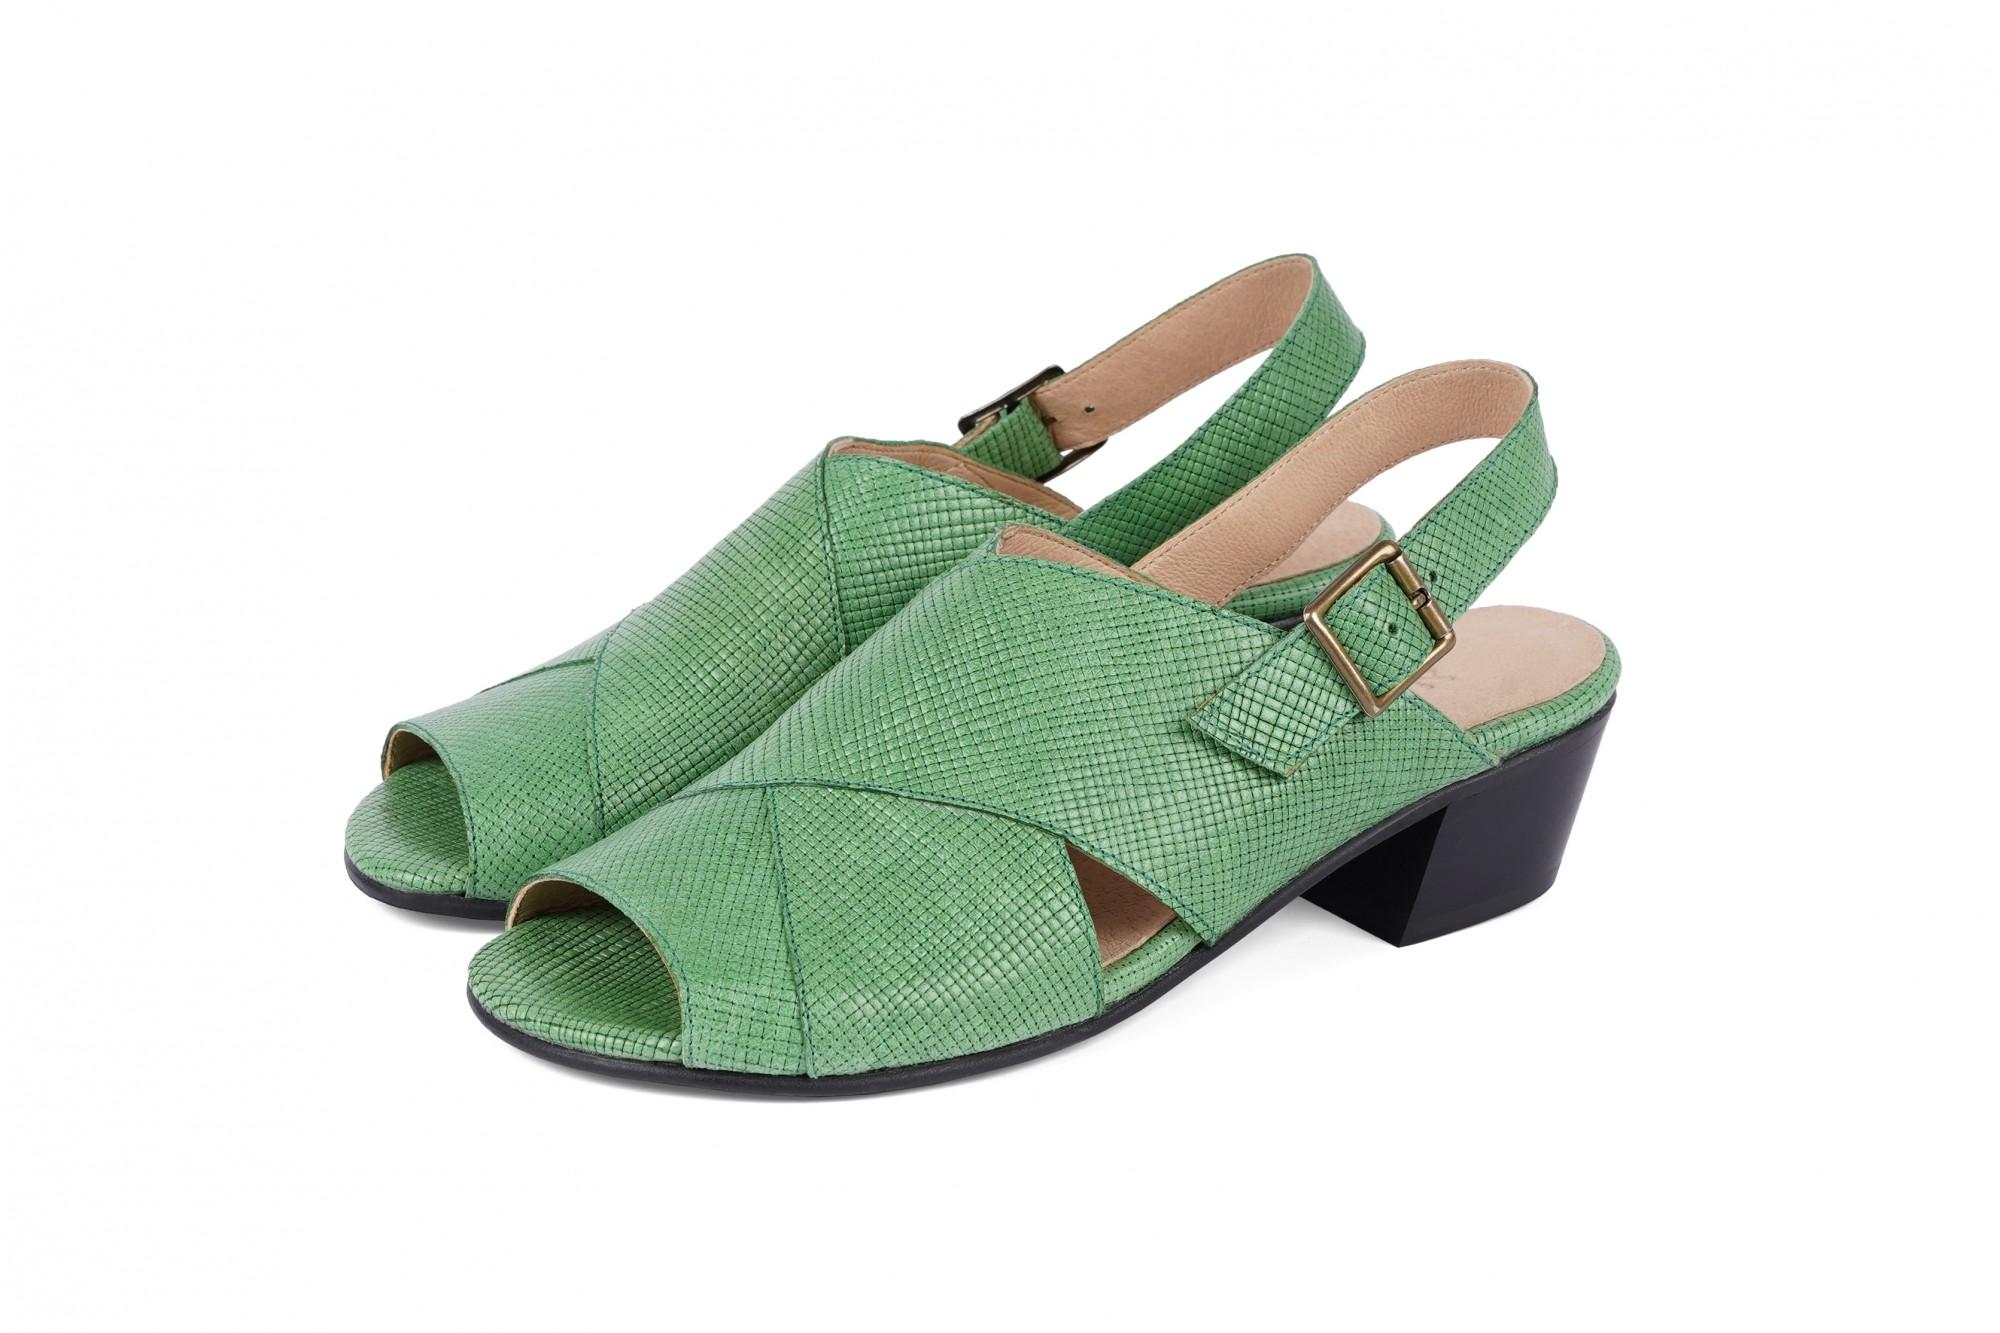 5fe92043c5 Handmade leather Shoes - Leather Sandals - Flat black ... - ADI KILAV